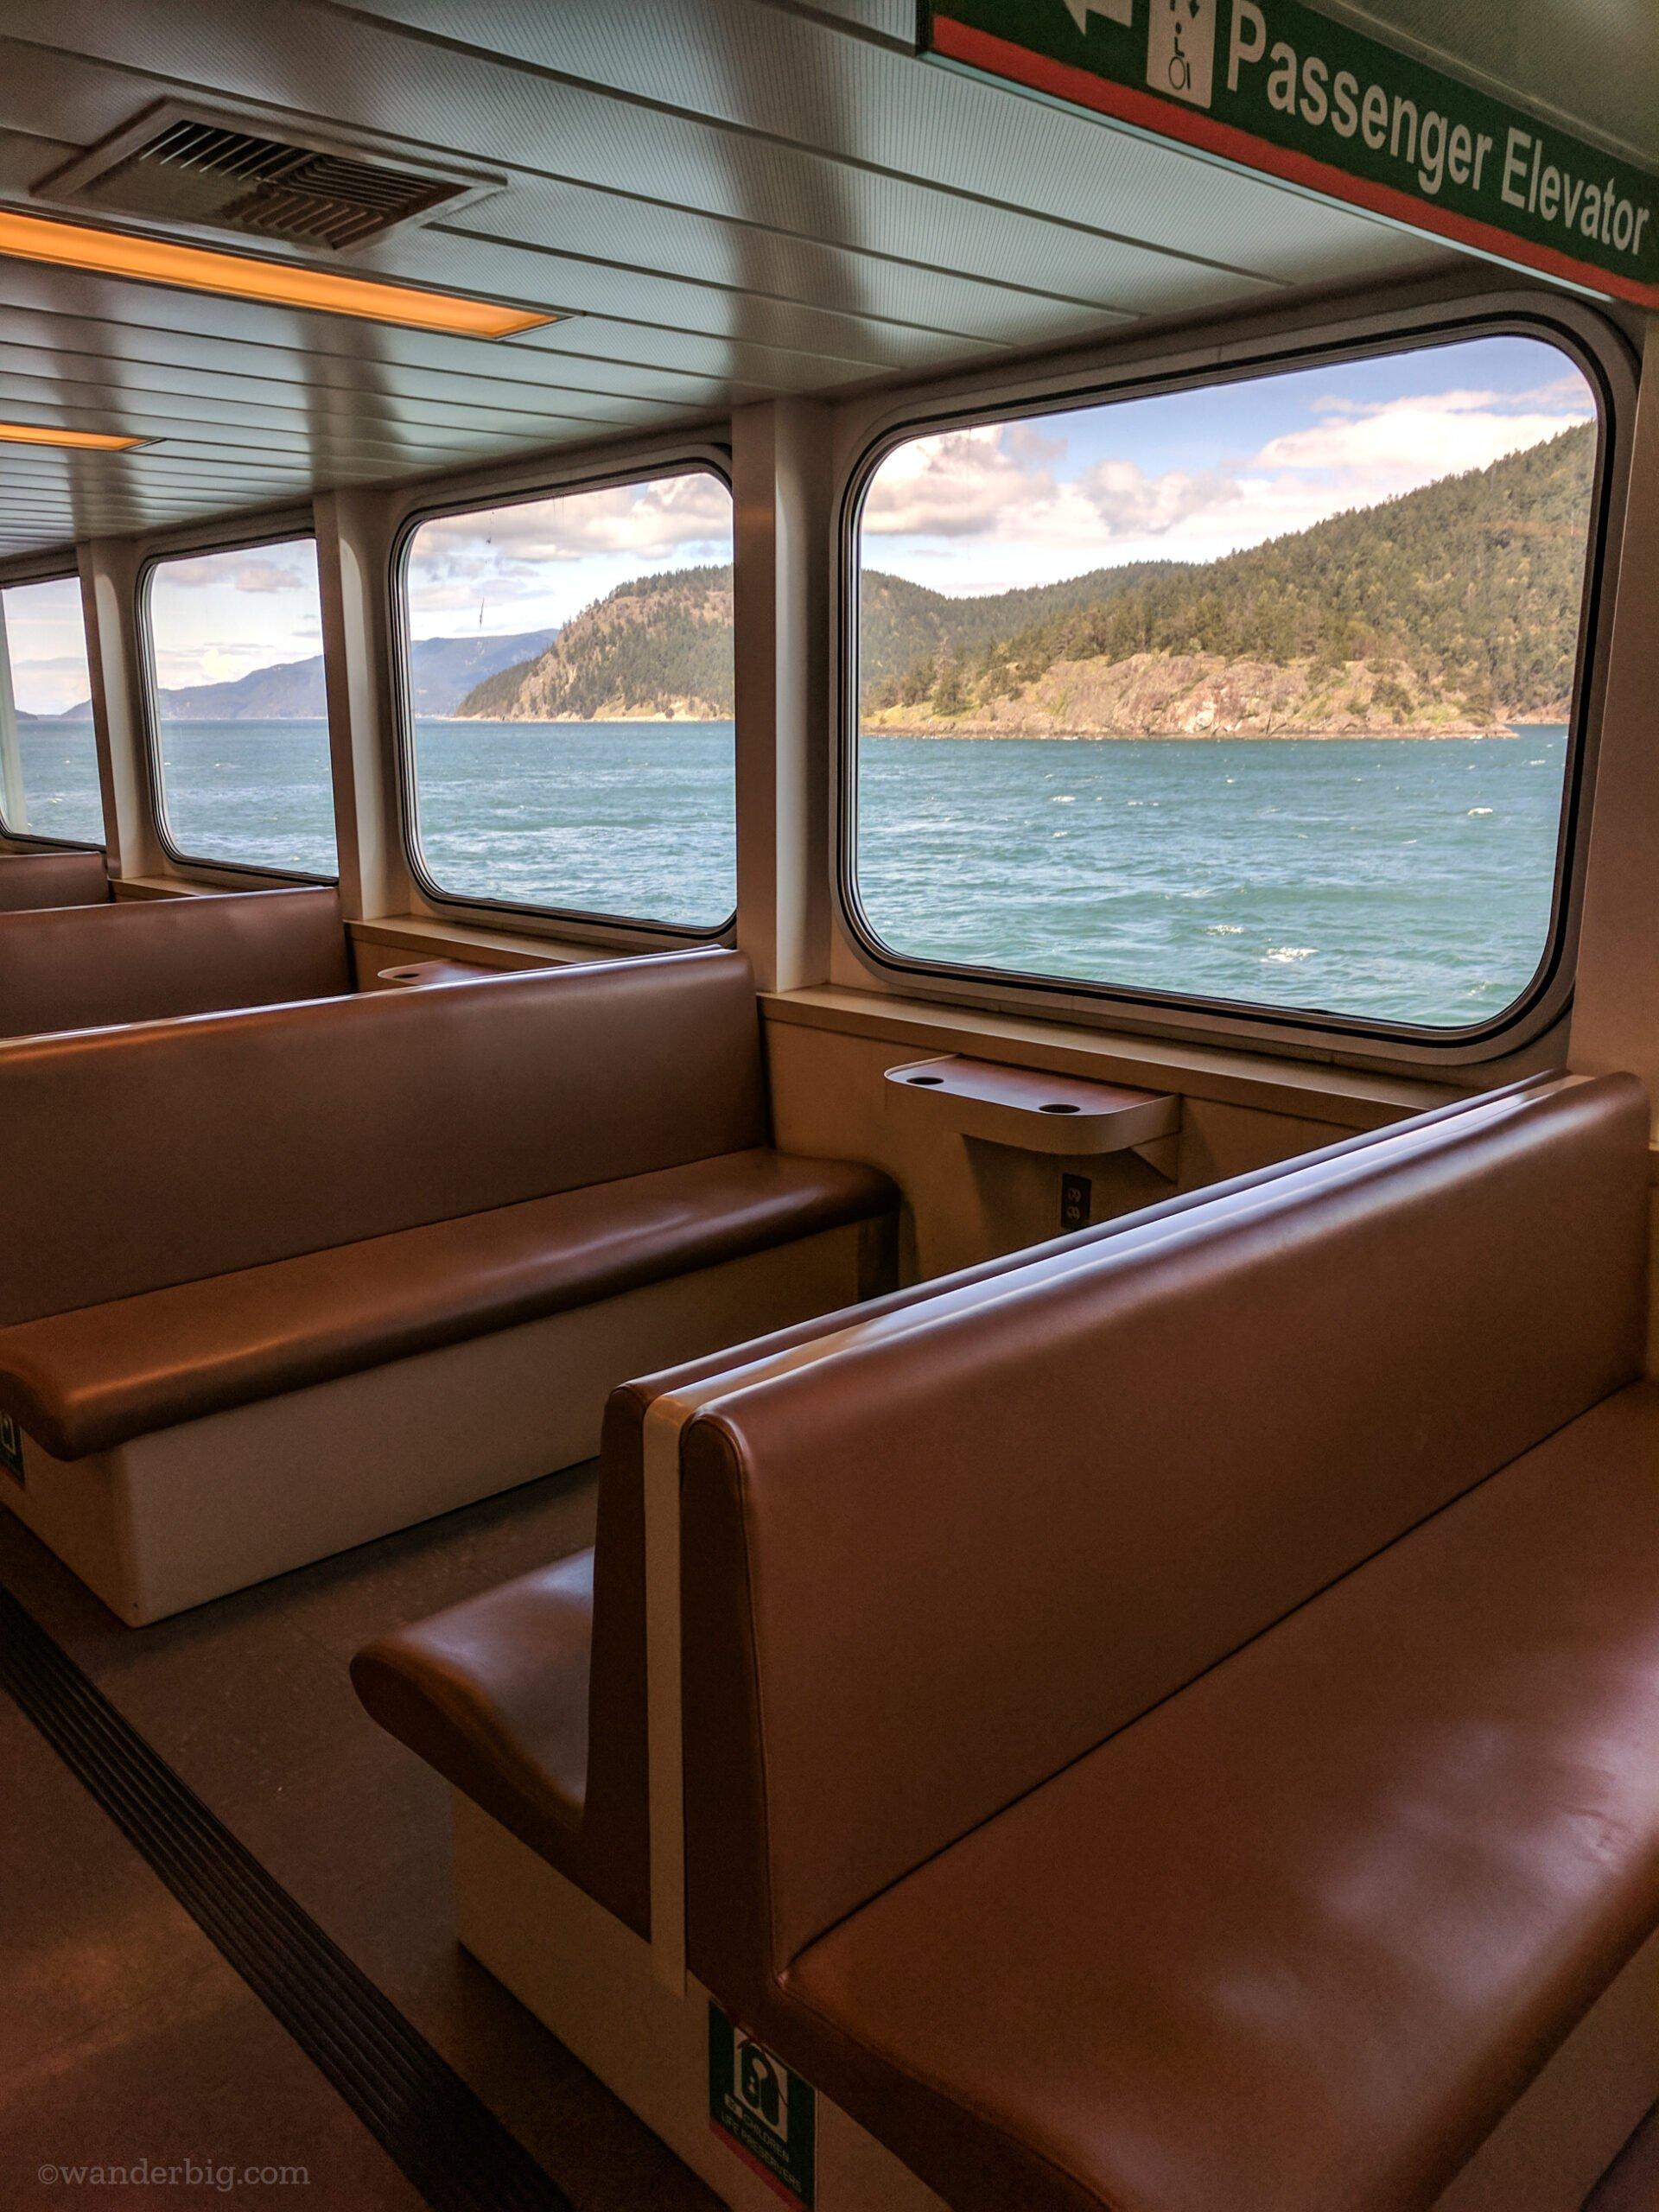 An empty passenger deck on a ferry from washington state mainland to san juan islands.